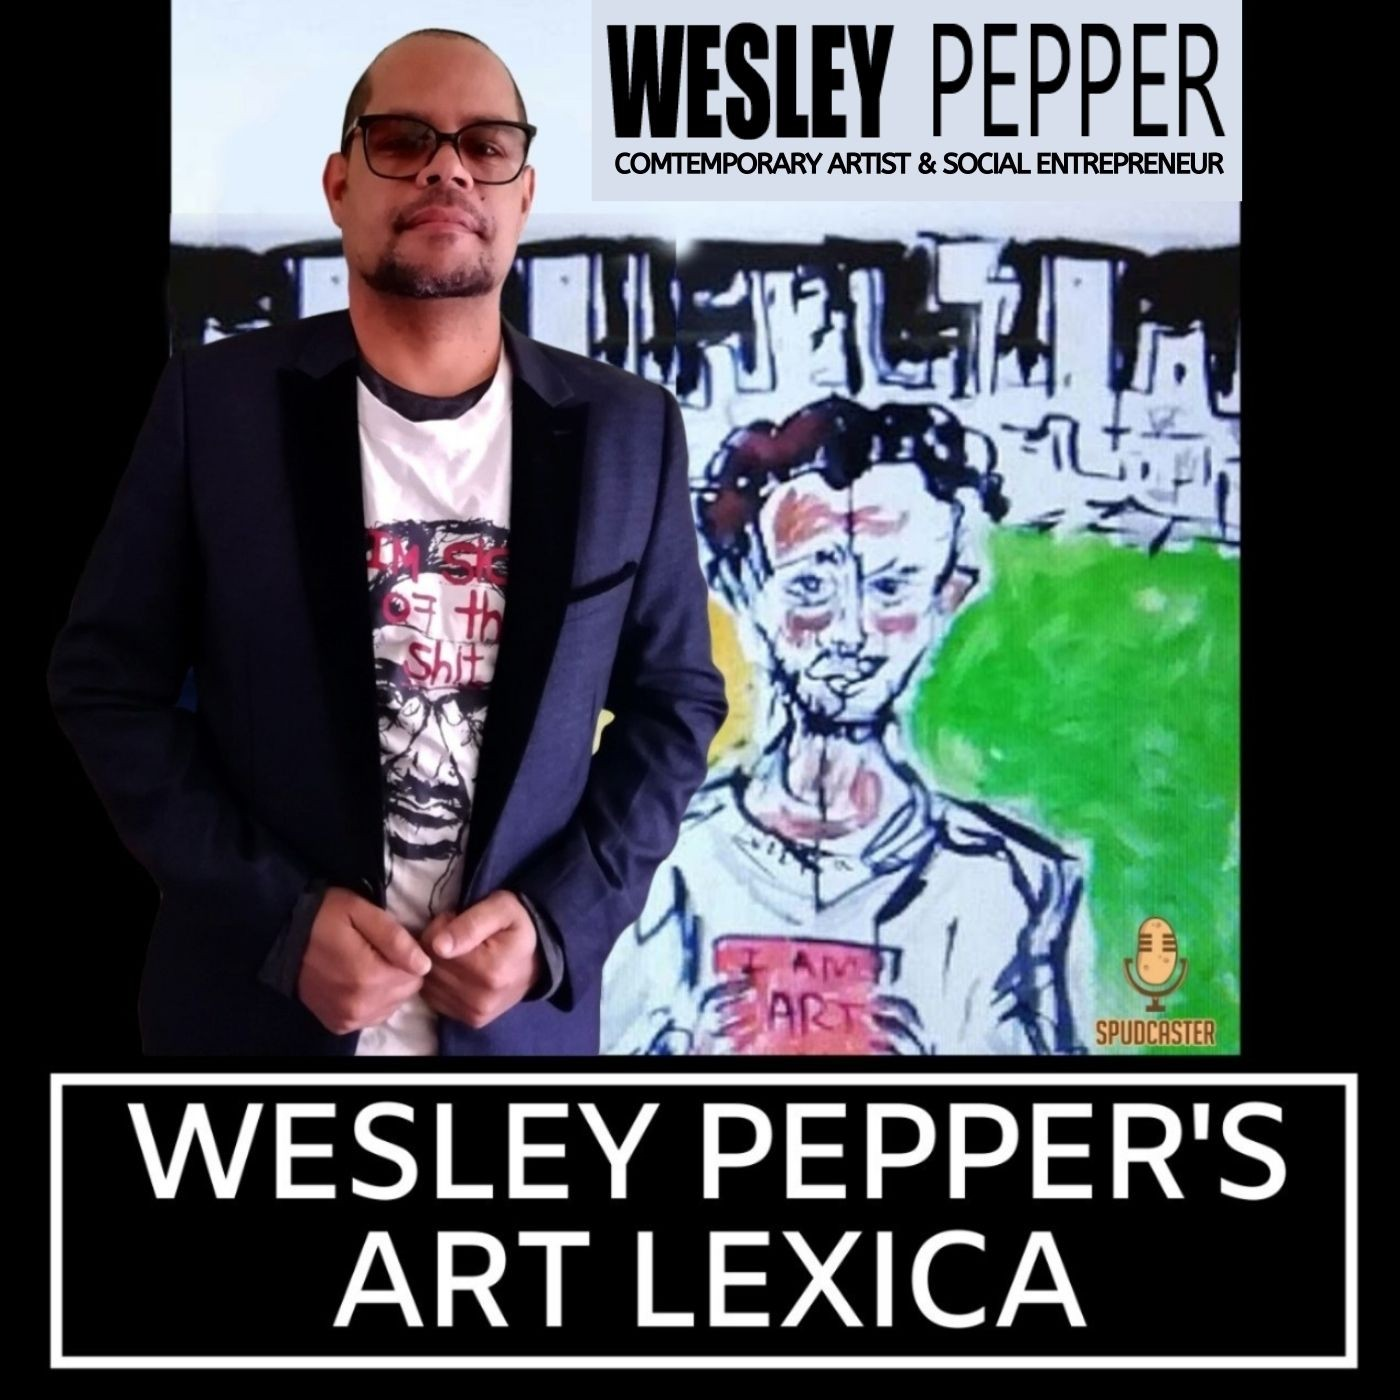 Wesley Pepper's Art Lexica